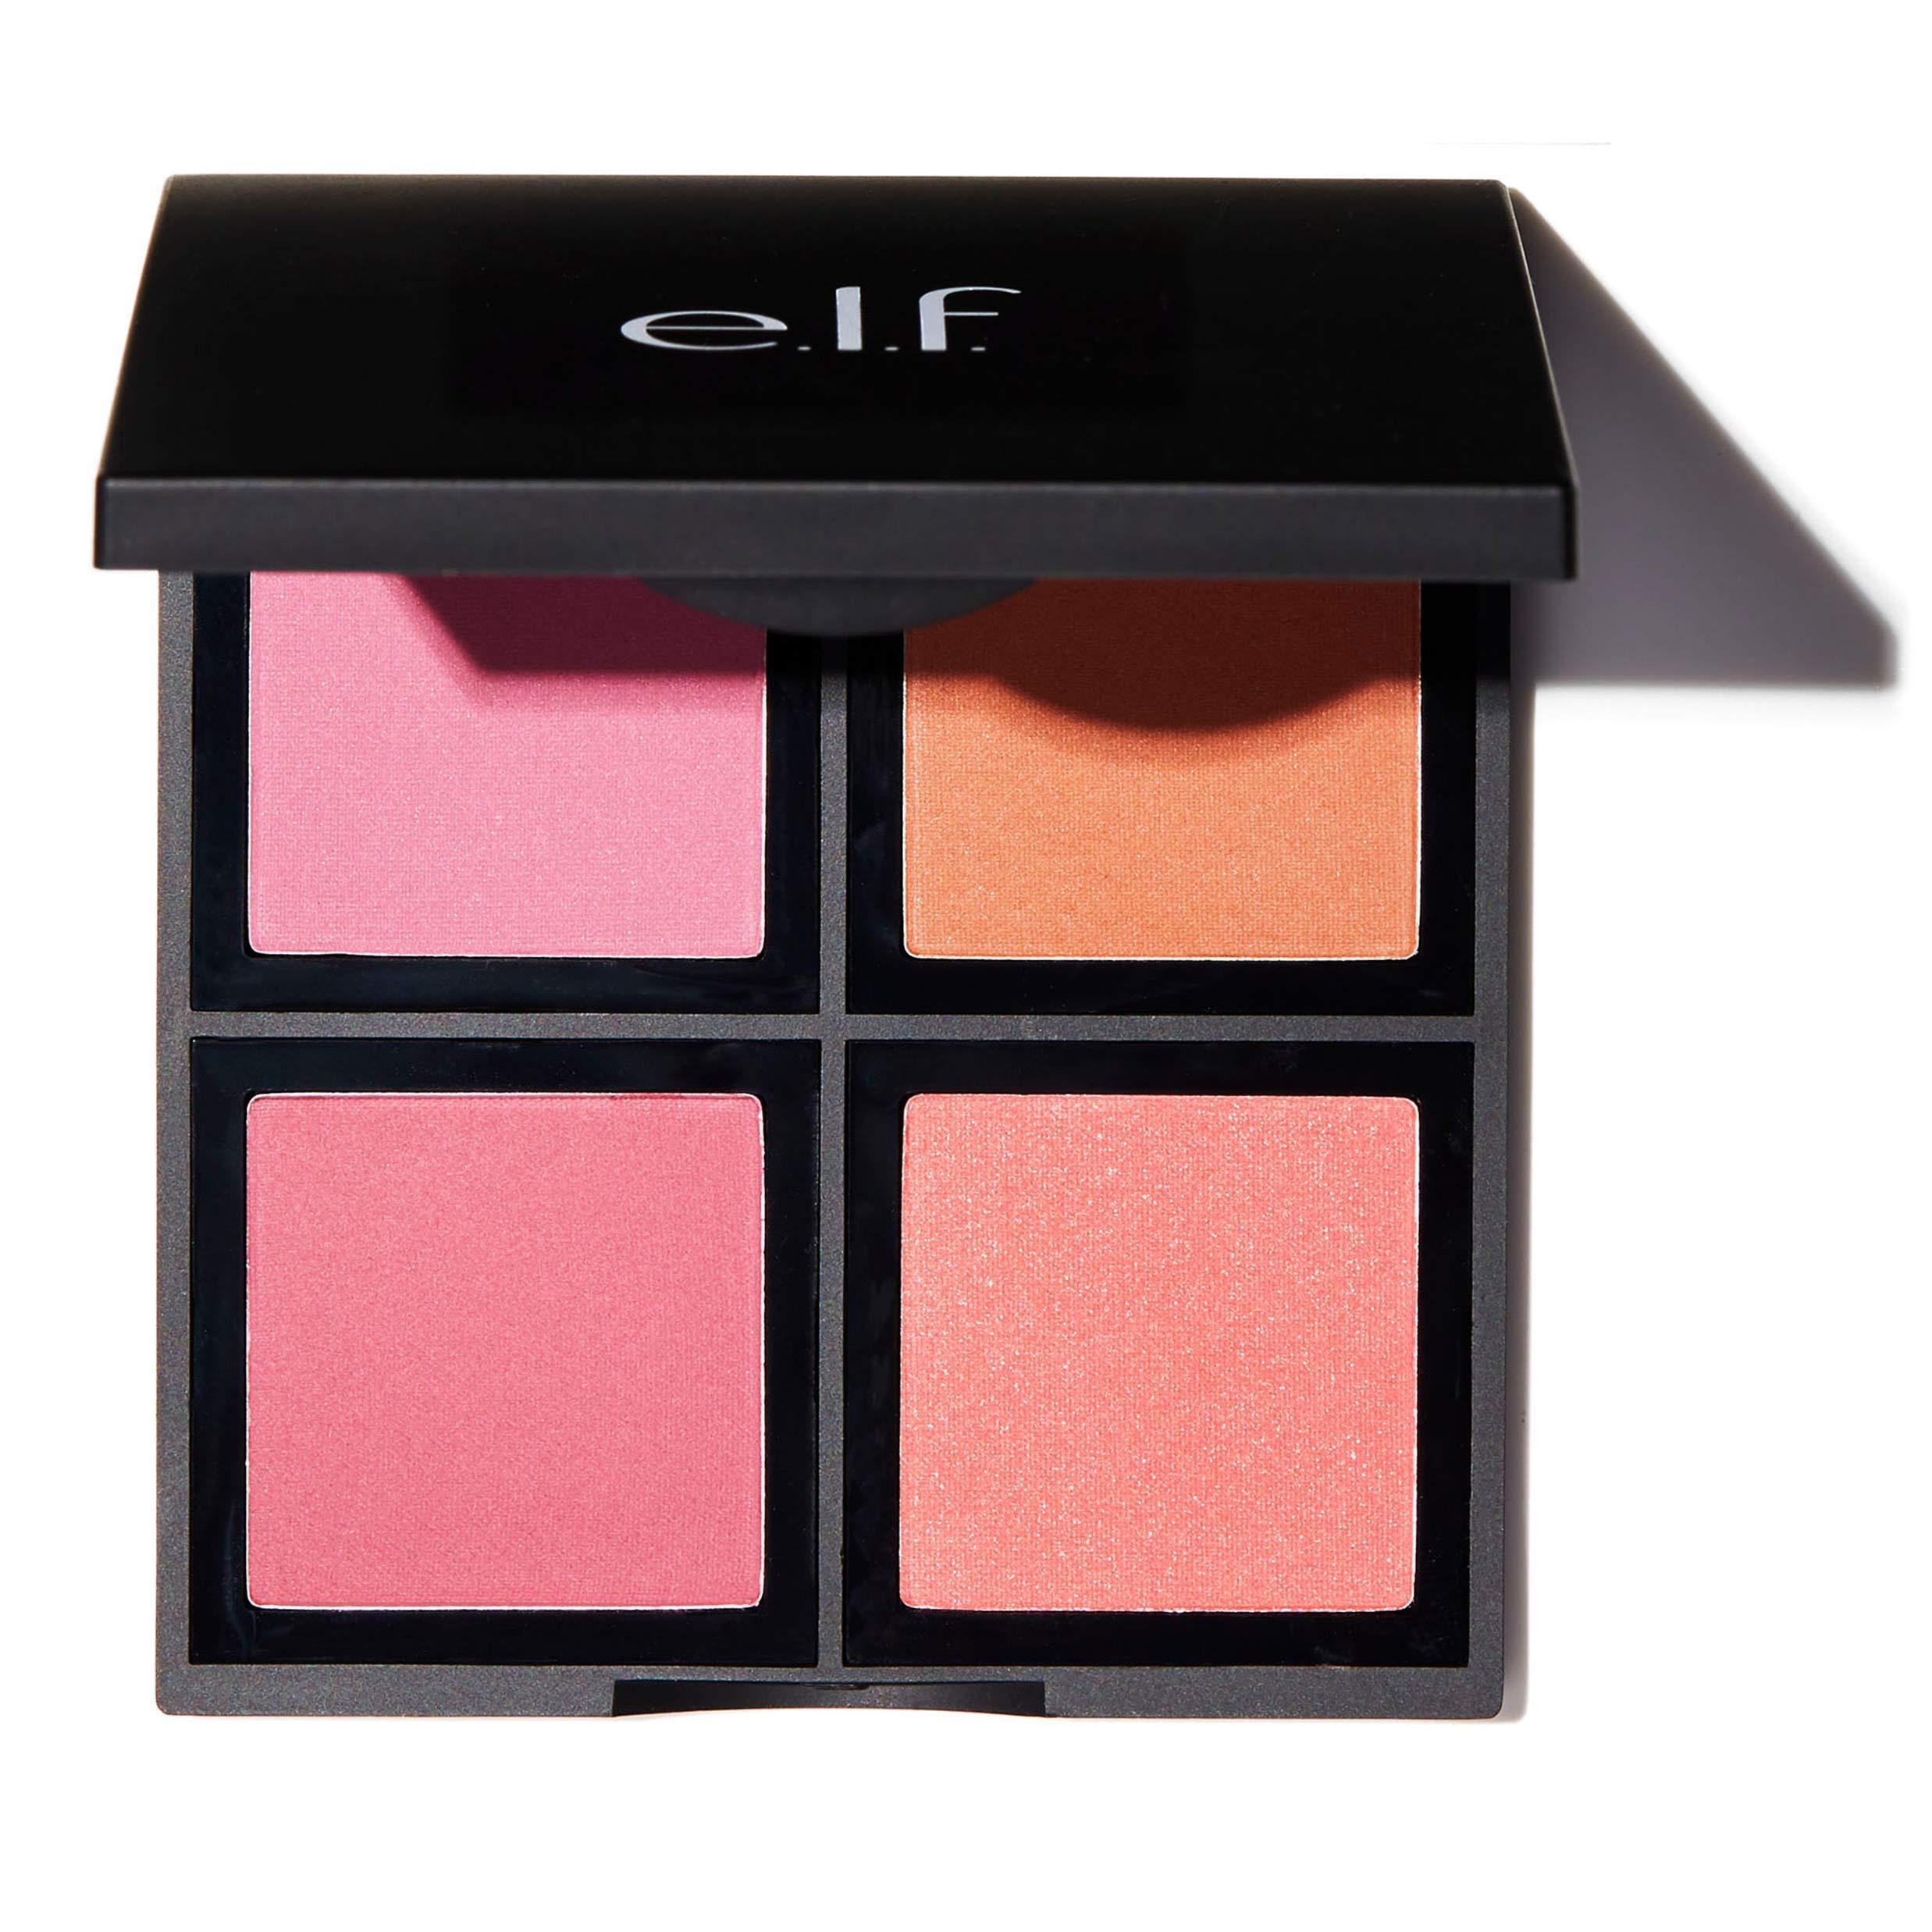 e.l.f. Cosmetics Powder Blush Palette, Four Blush Shades for Beautiful, Long-Lasting Pigment, Light